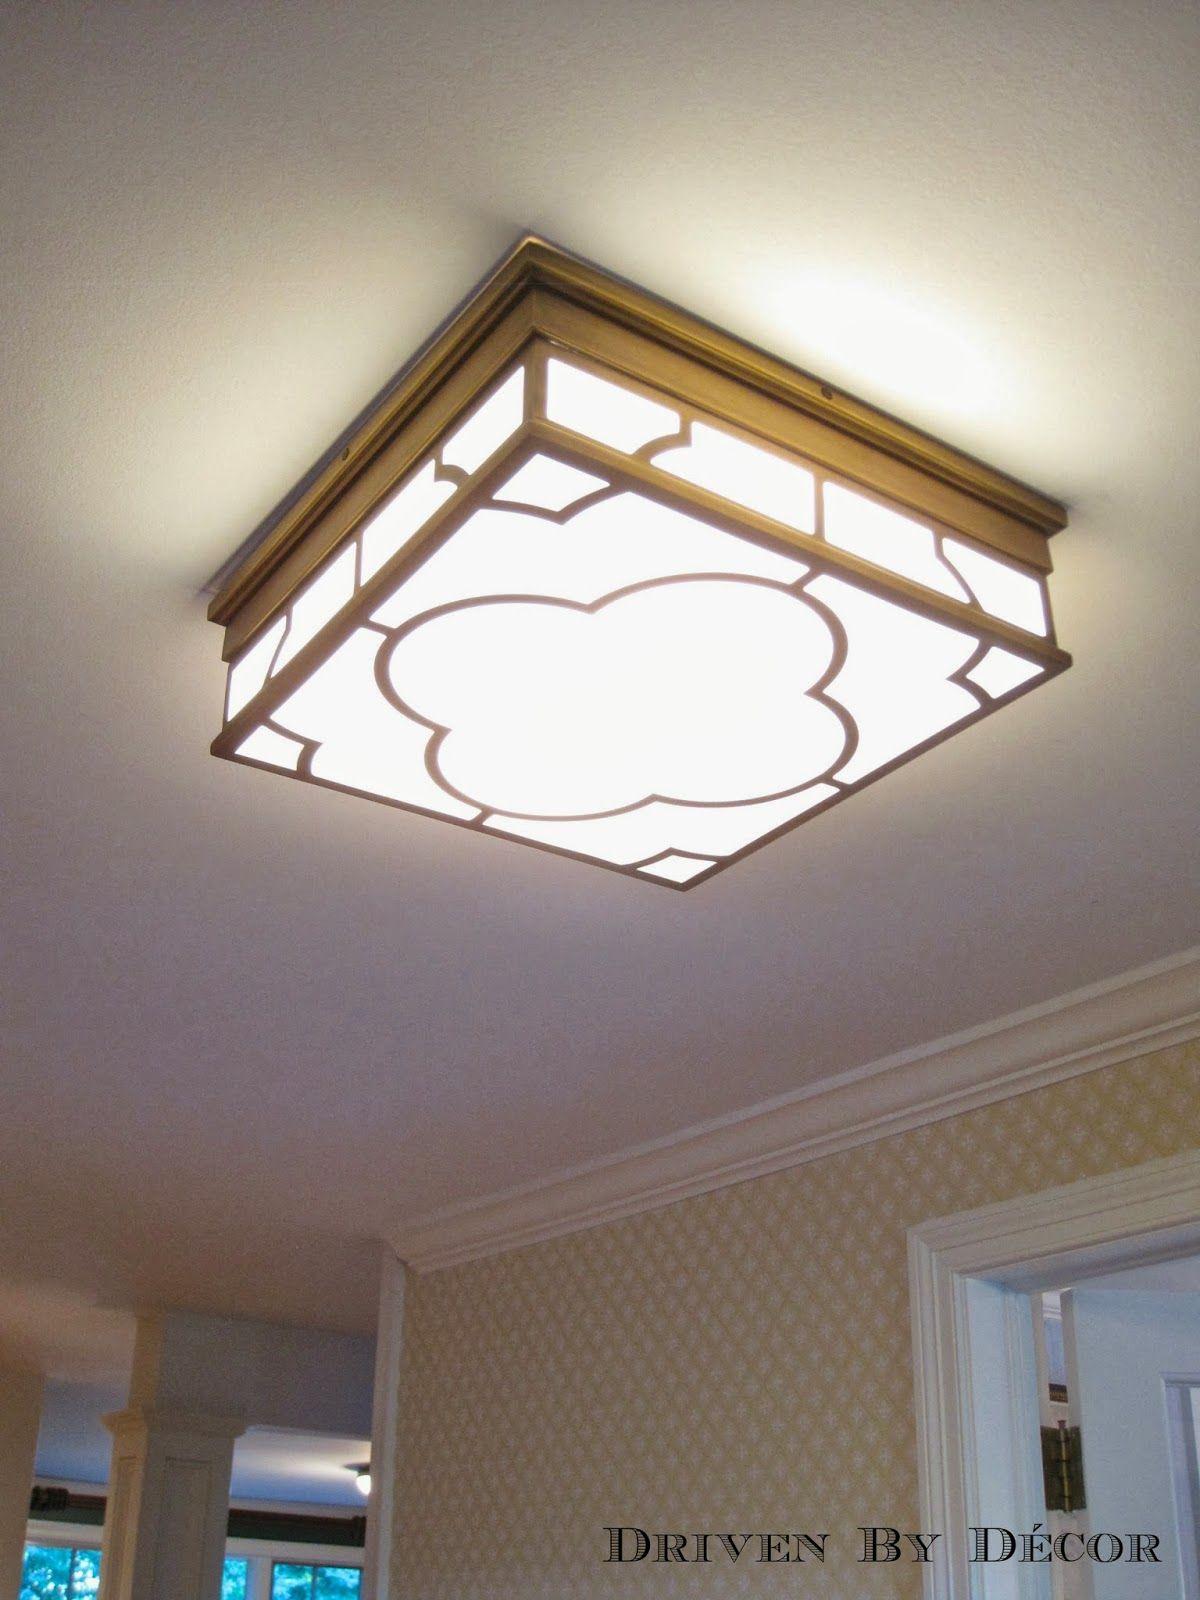 ceiling lights for kitchen Flush Mount Kitchen Ceiling Light Low Profile Flush Mount Ceiling Light Fixtures Flush Mount Light